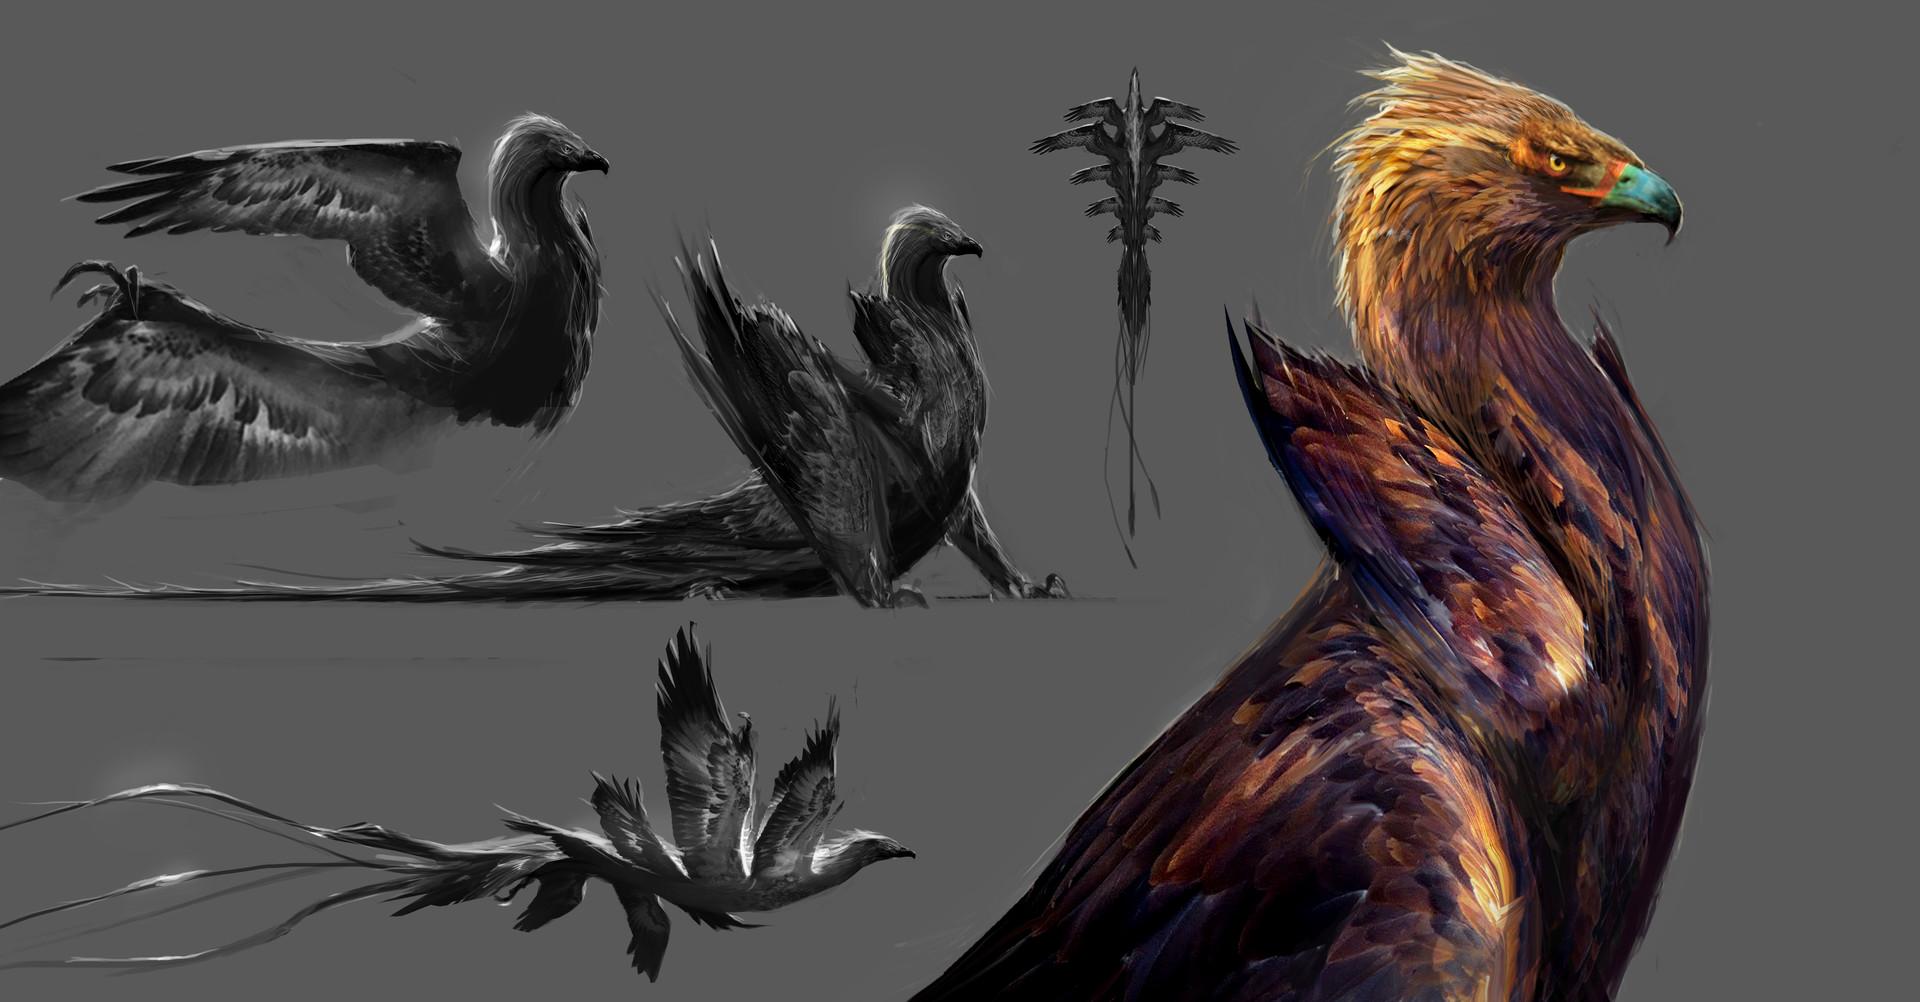 Dan baker boswell thunderbird sketch v006 003 db